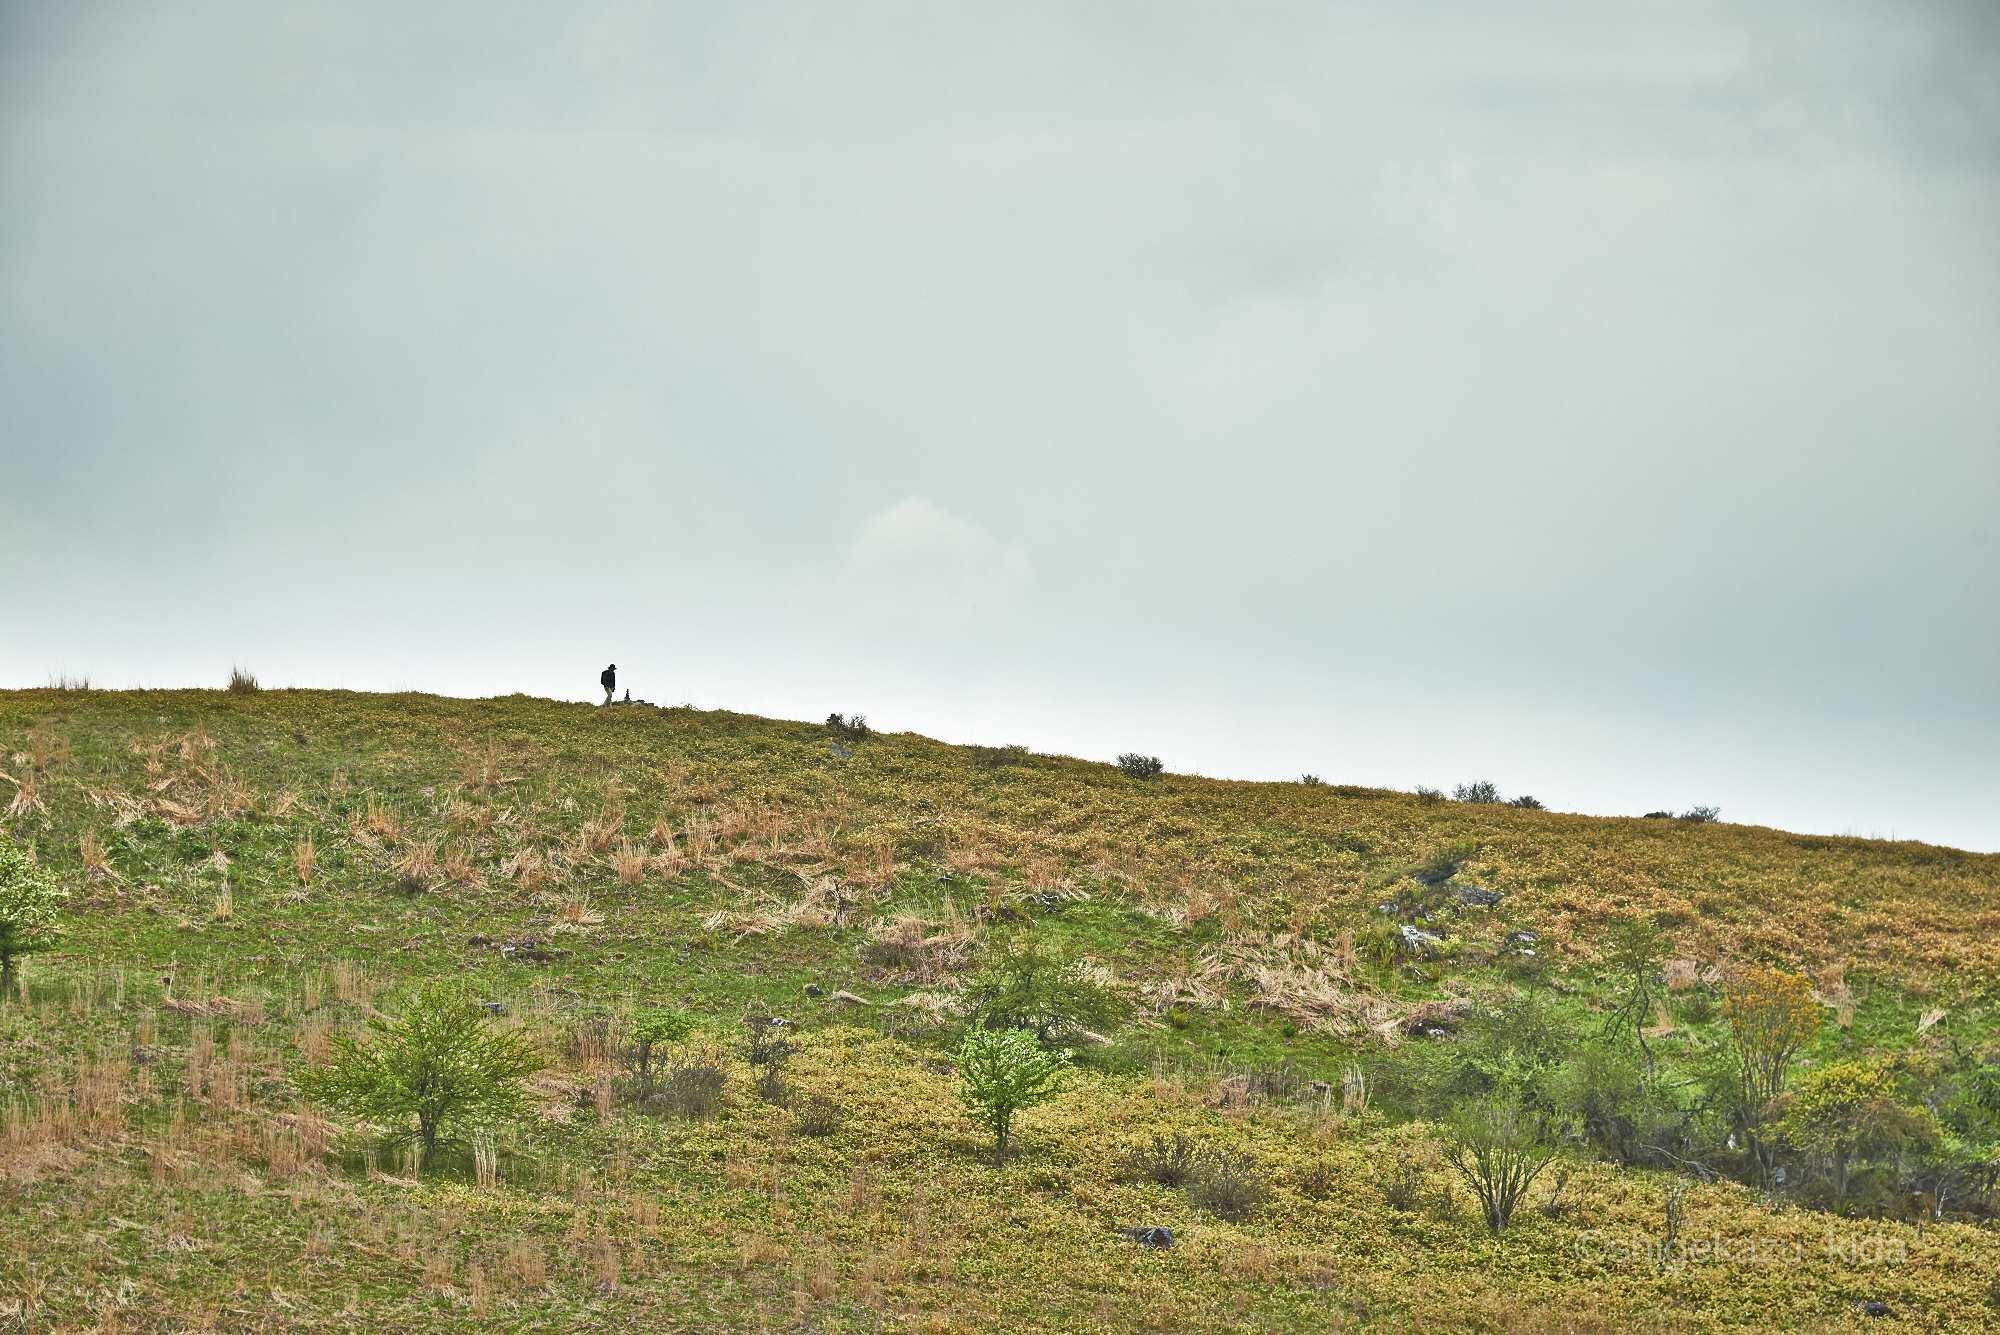 霧ヶ峰稜線と登山者